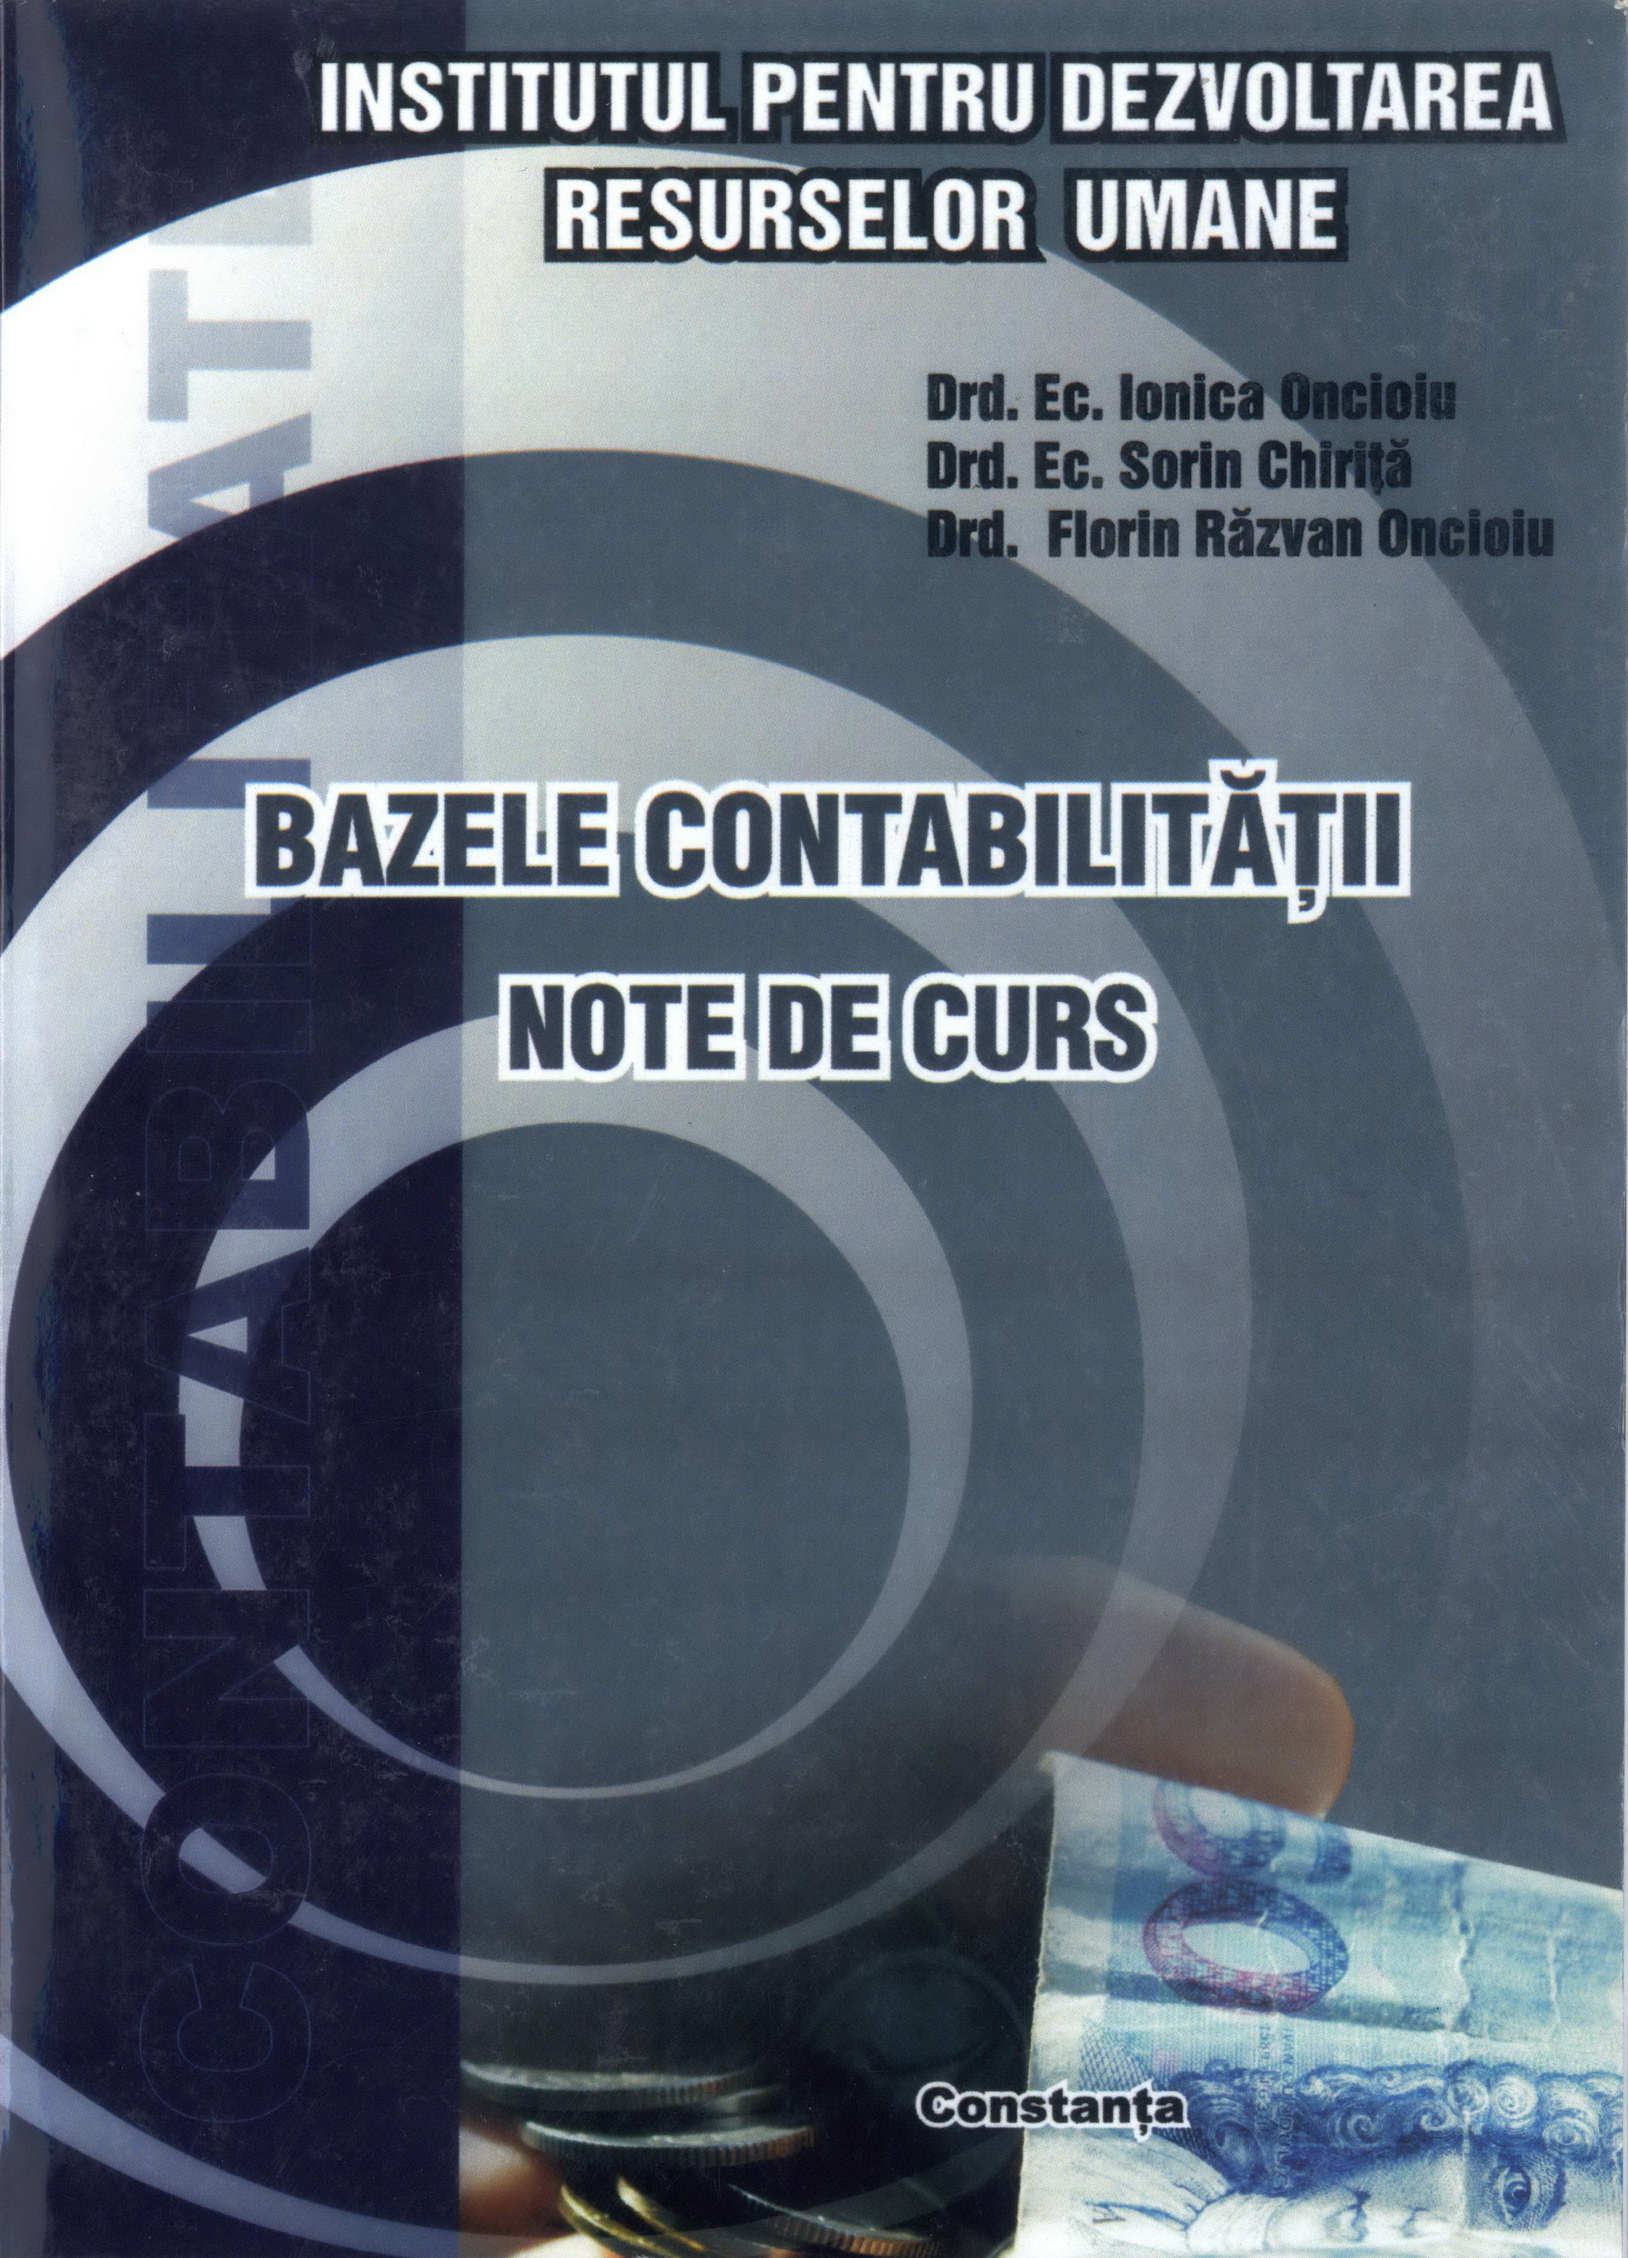 Autori: Oncioiu Ionica, Chirita Sorin, Oncioiu Florin Razvan